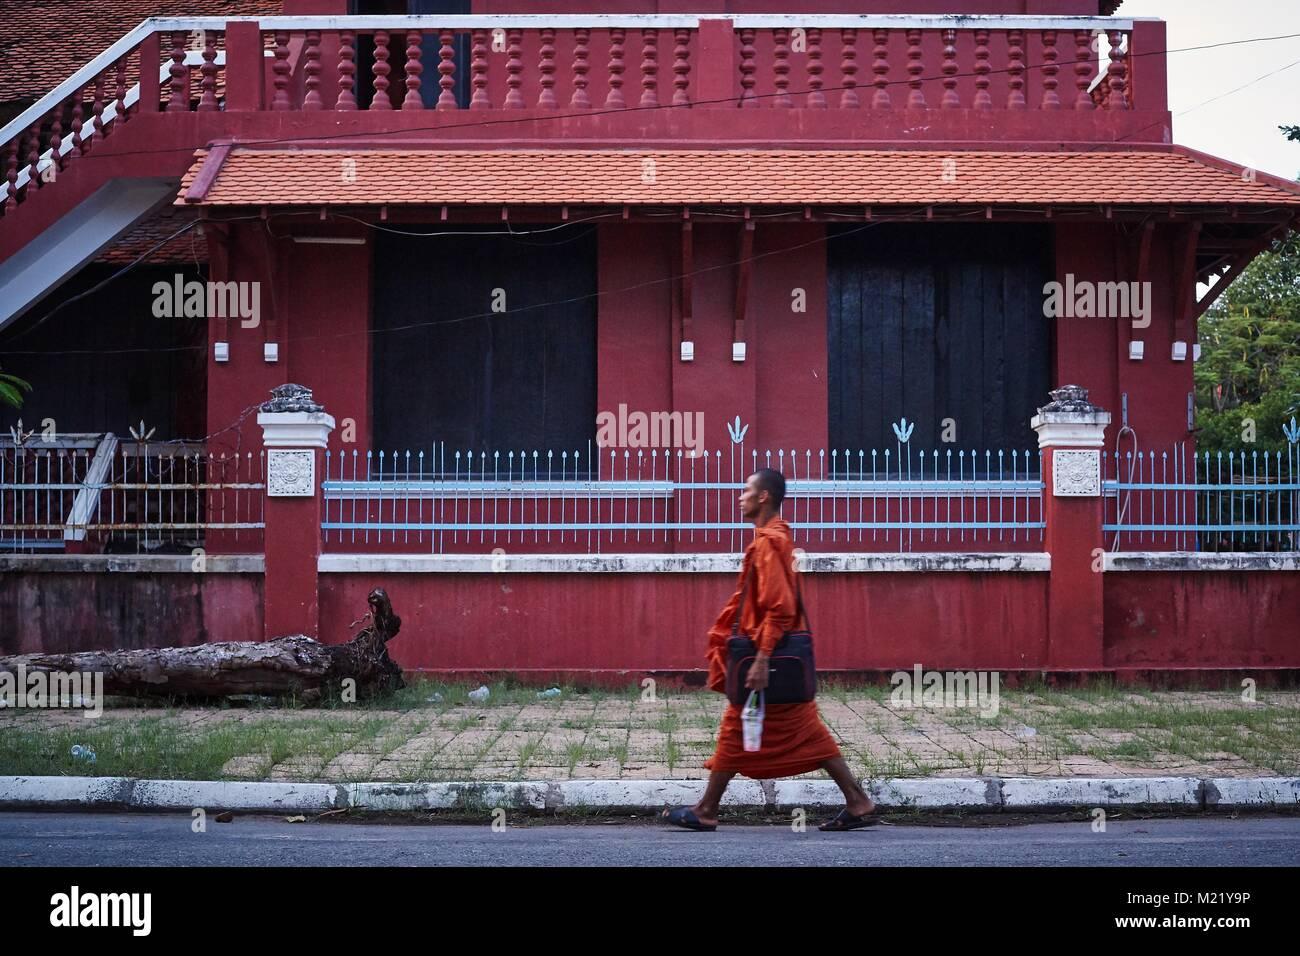 Monk walkink en face du Musée National, Phnom Penh, Cambodge Photo Stock